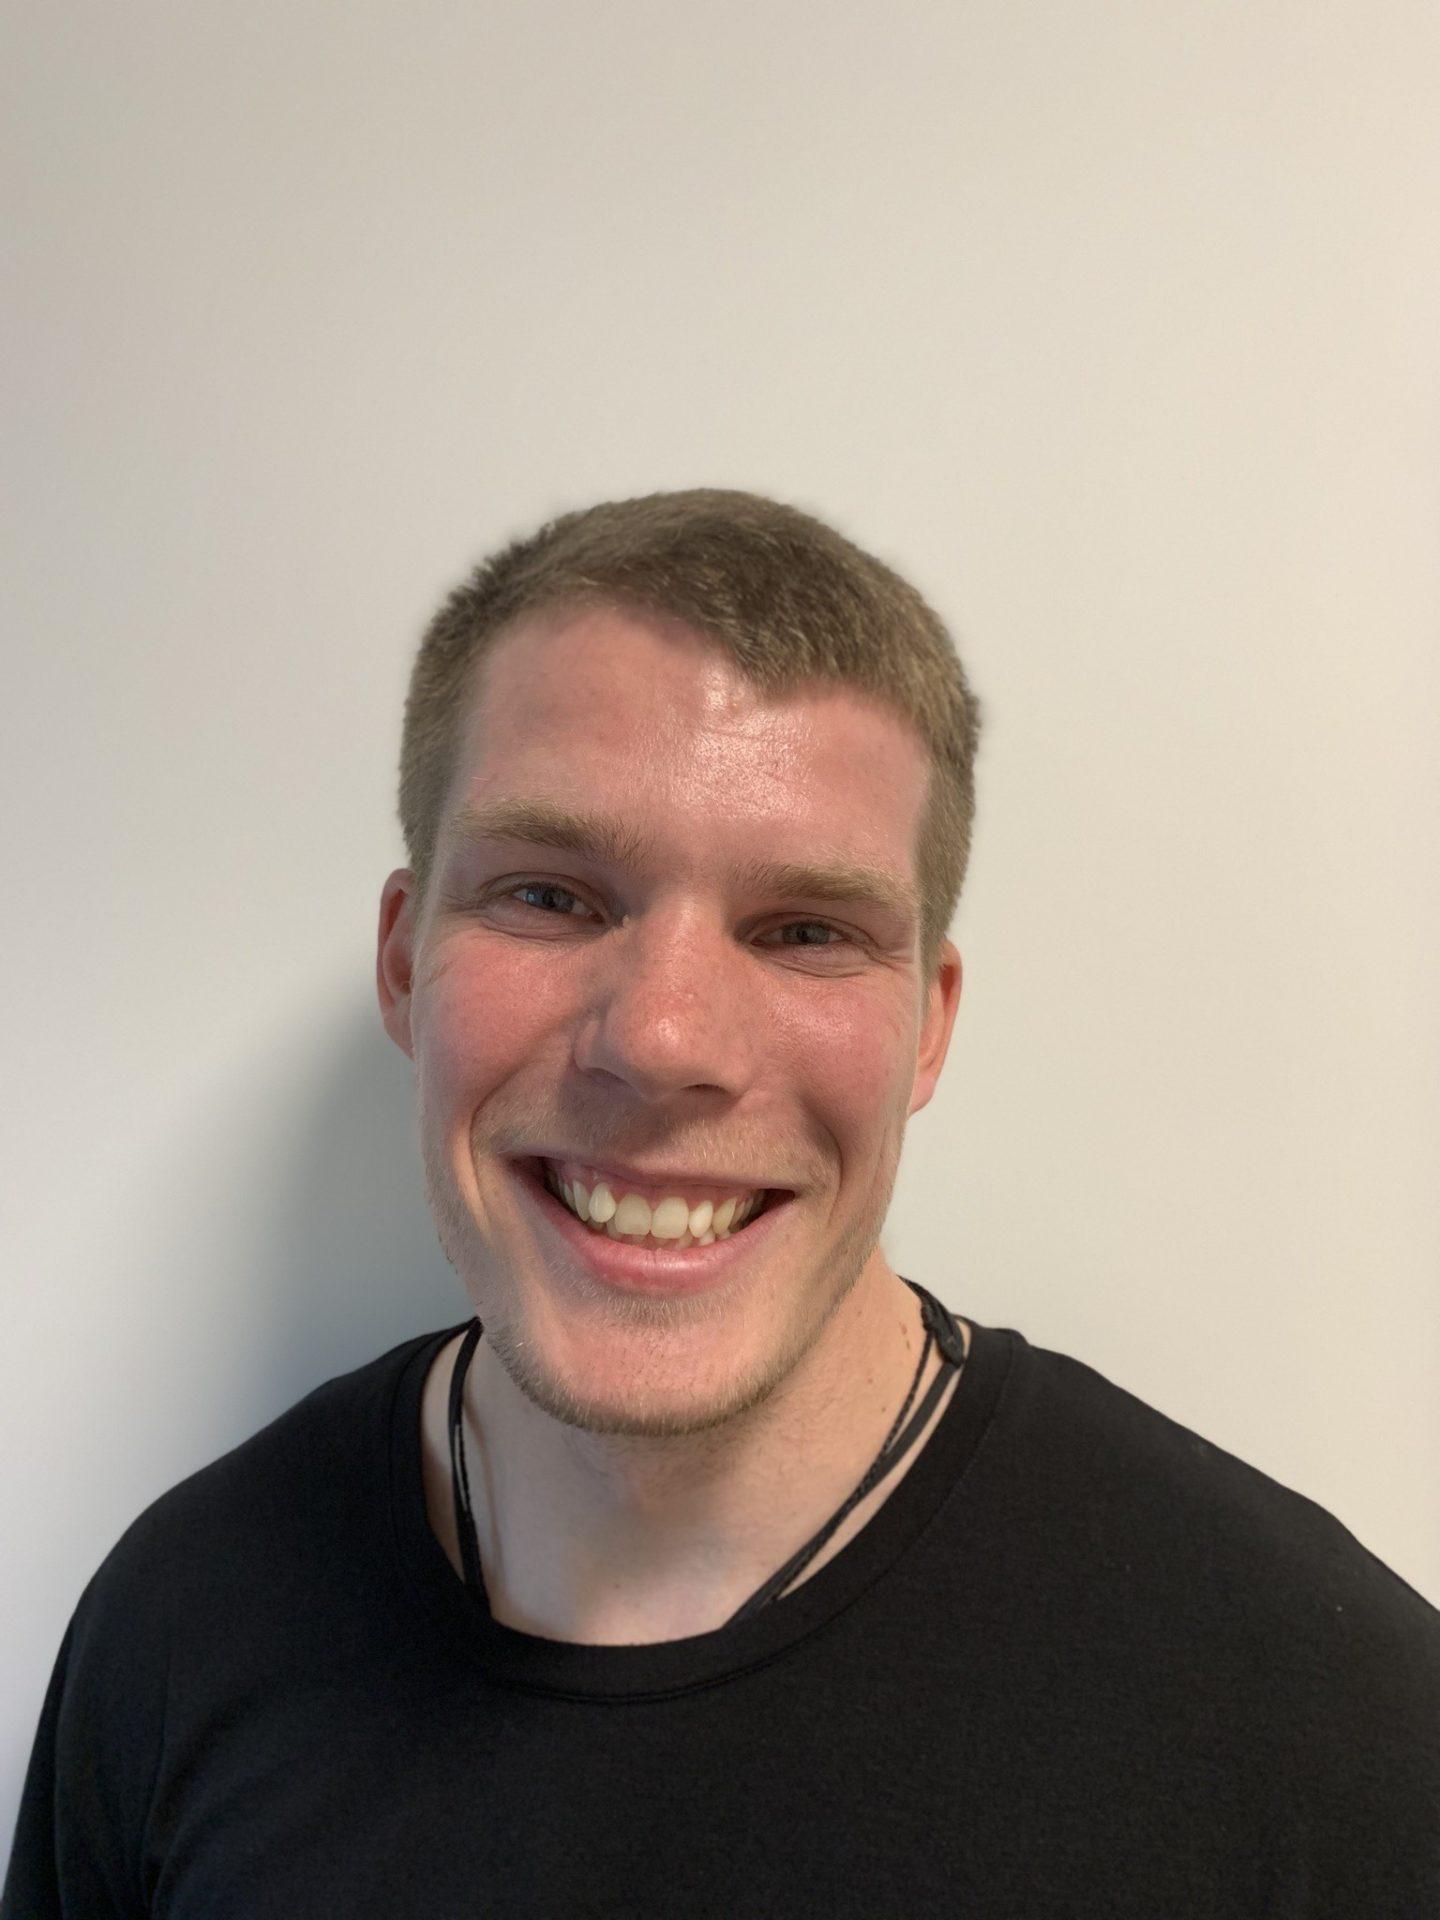 Emil Valdemar, Kiropraktorstuderende og massør